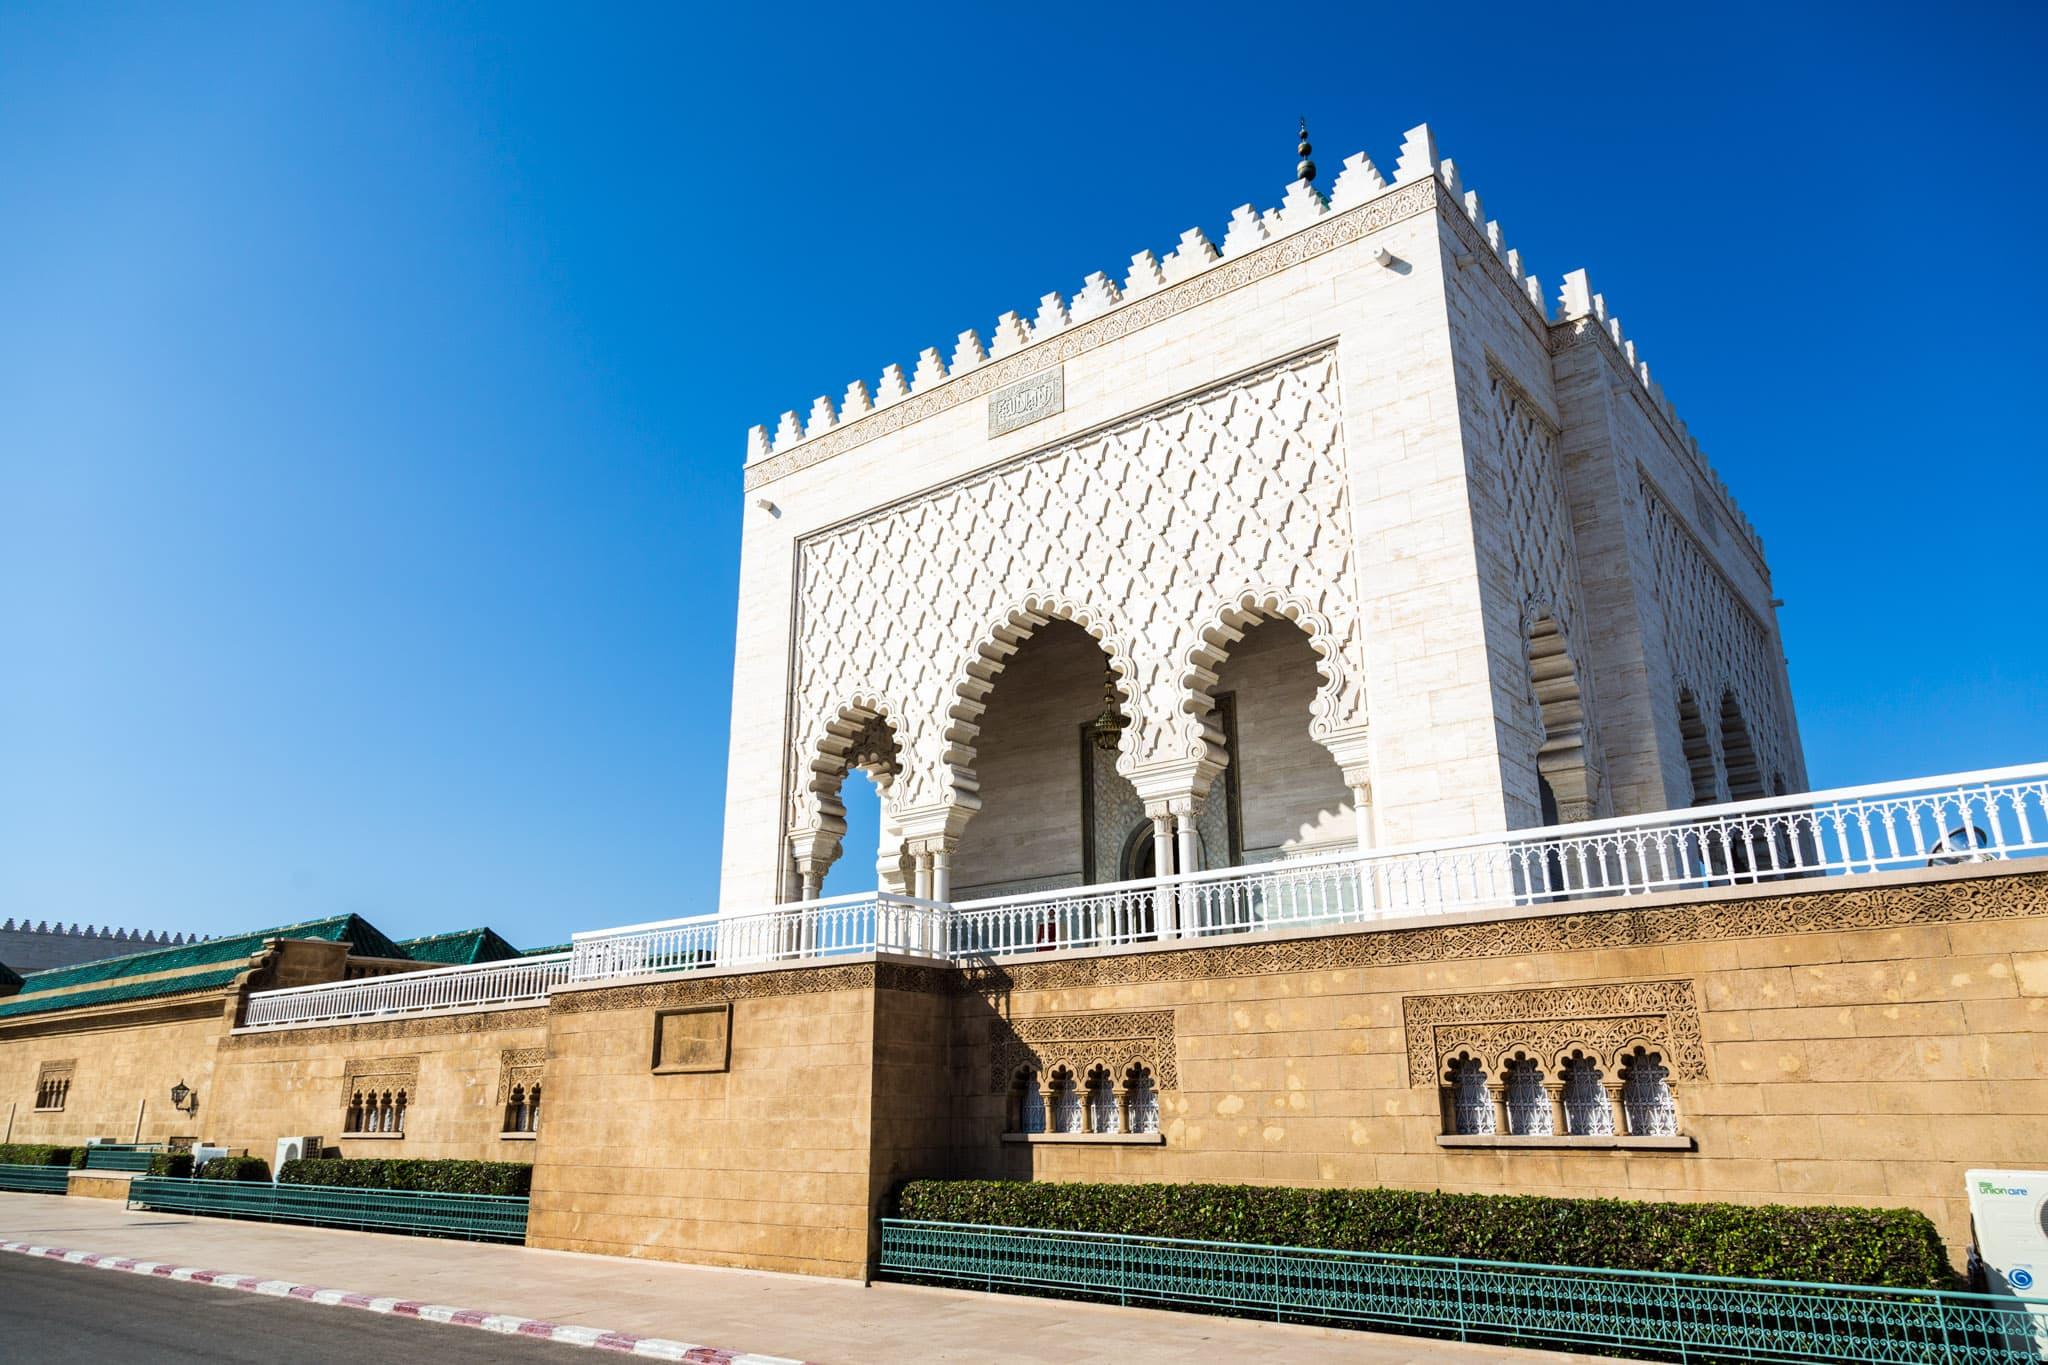 Marrocos - Natureza e luxo